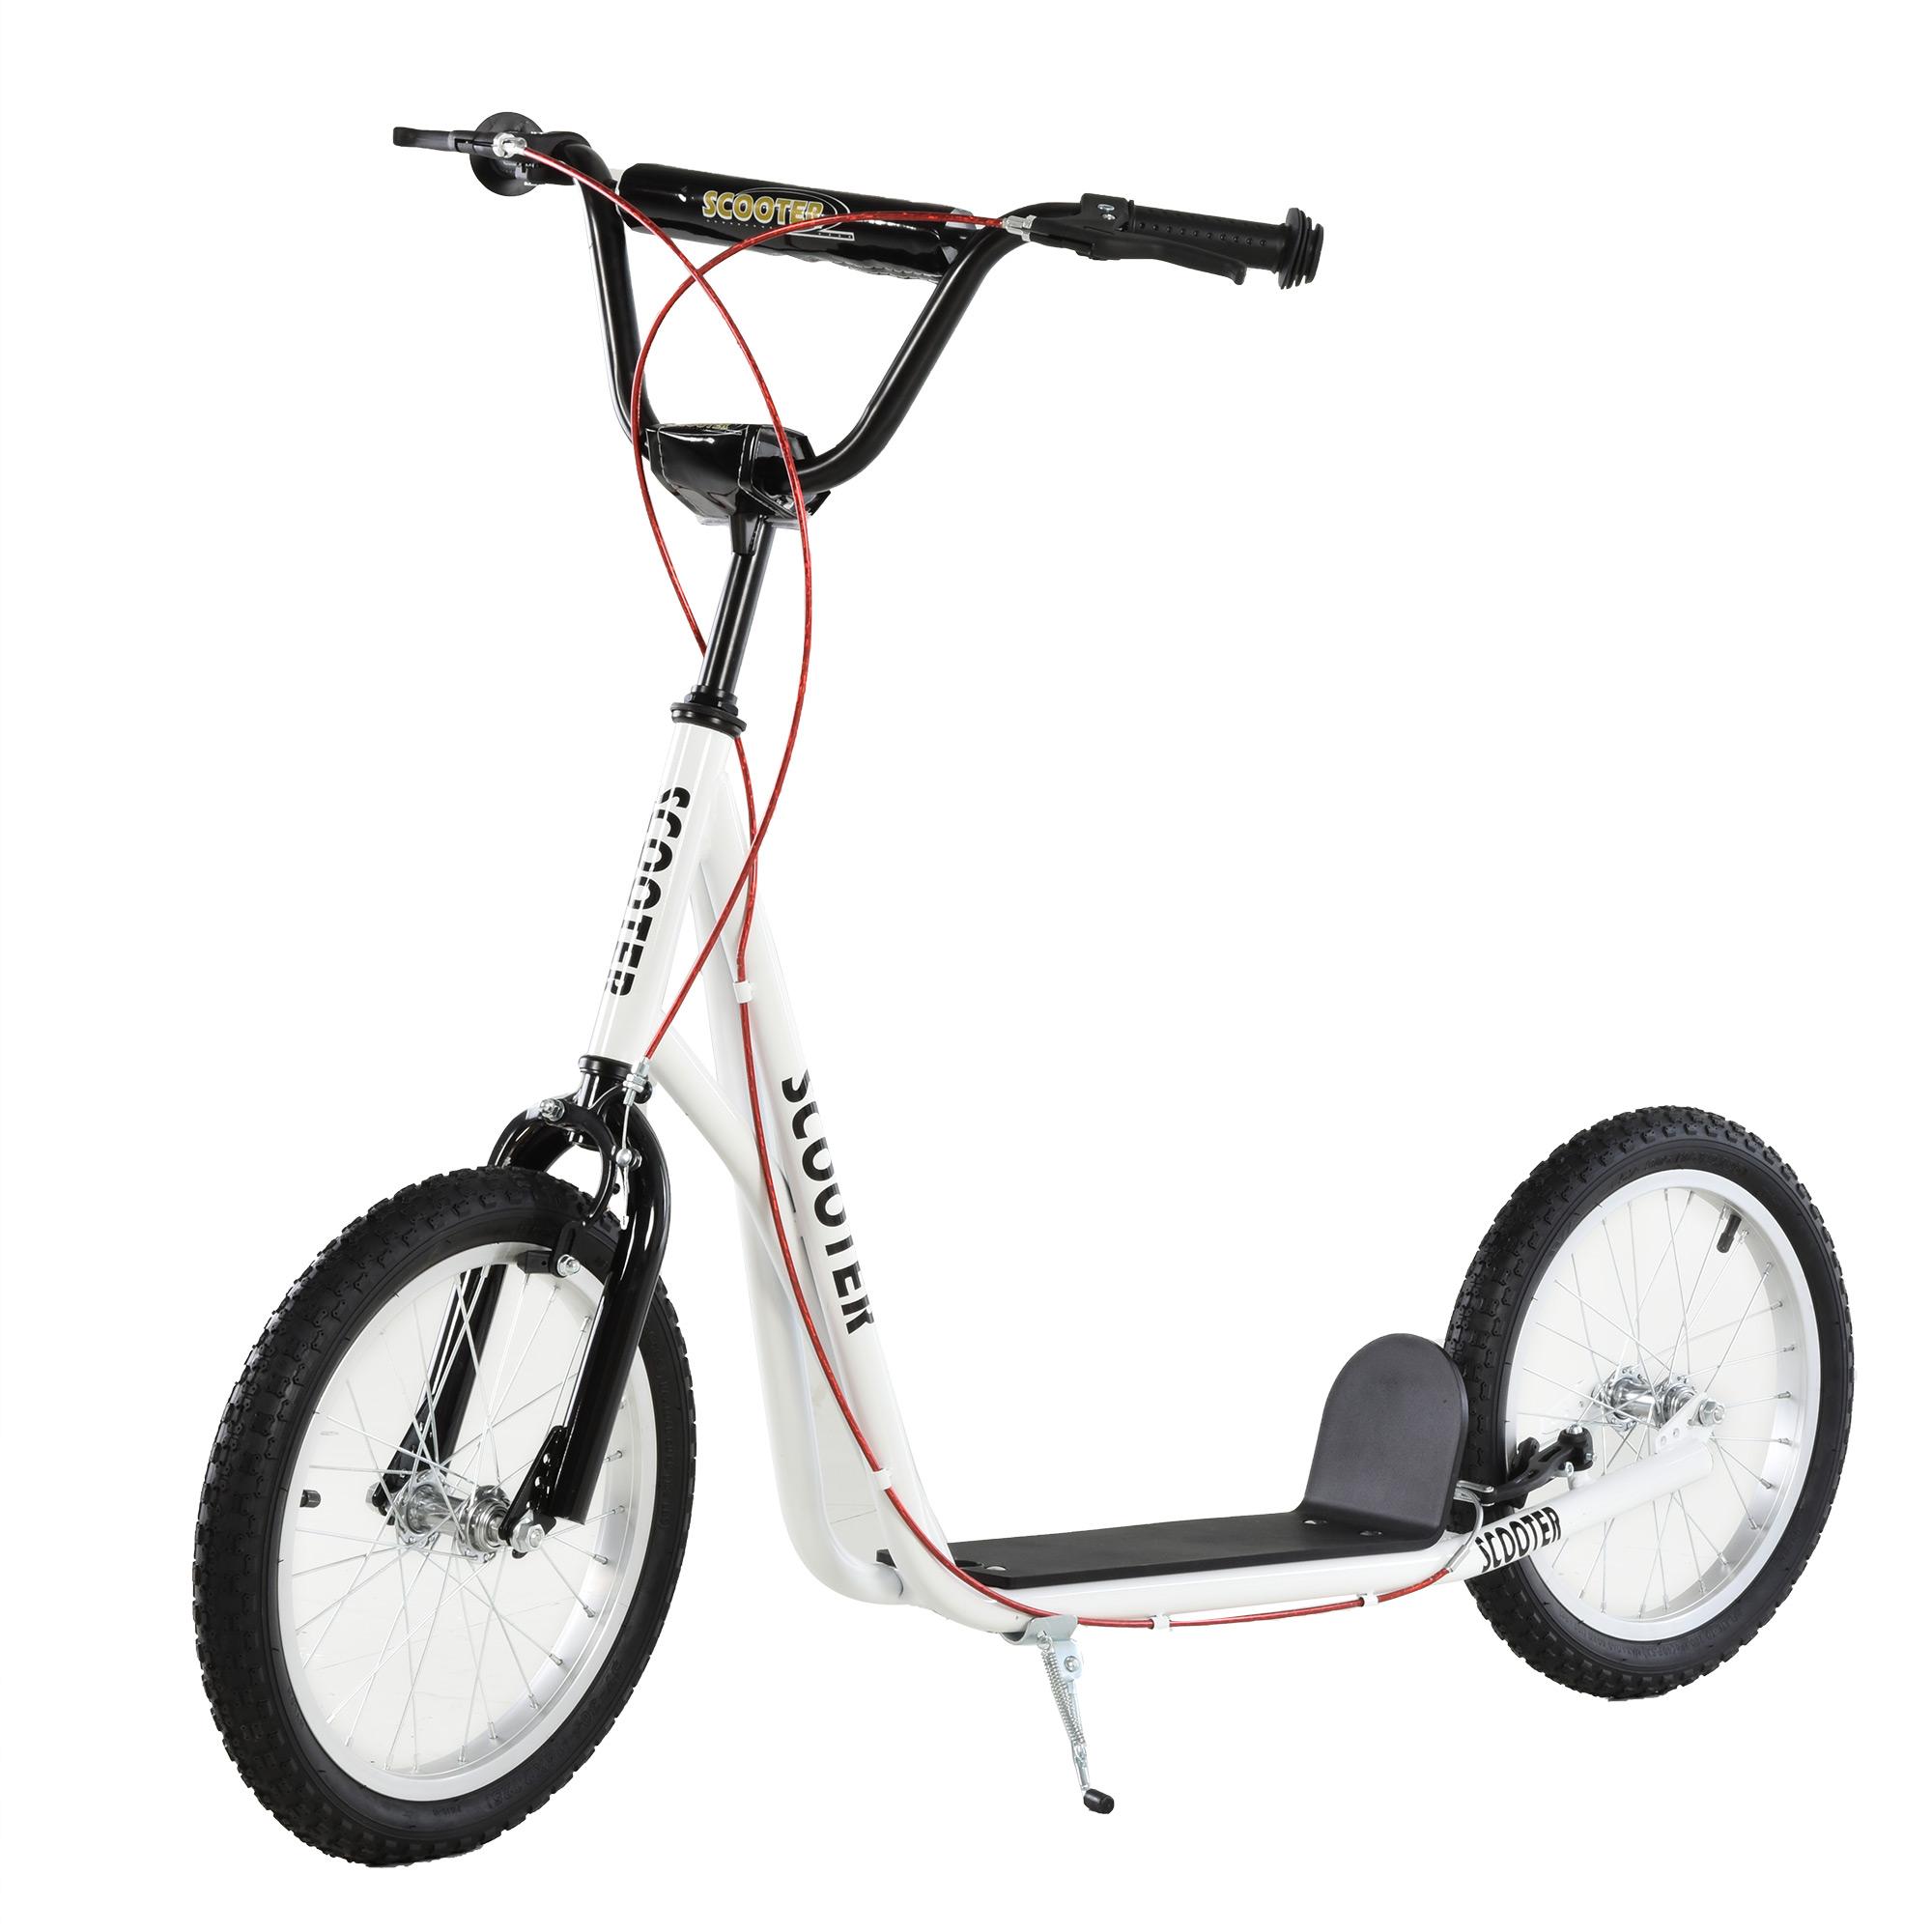 Indexbild 46 - HOMCOM-Tretroller-Kinderroller-Scooter-Cityroller-Roller-verstellbar-Blau-Gruen